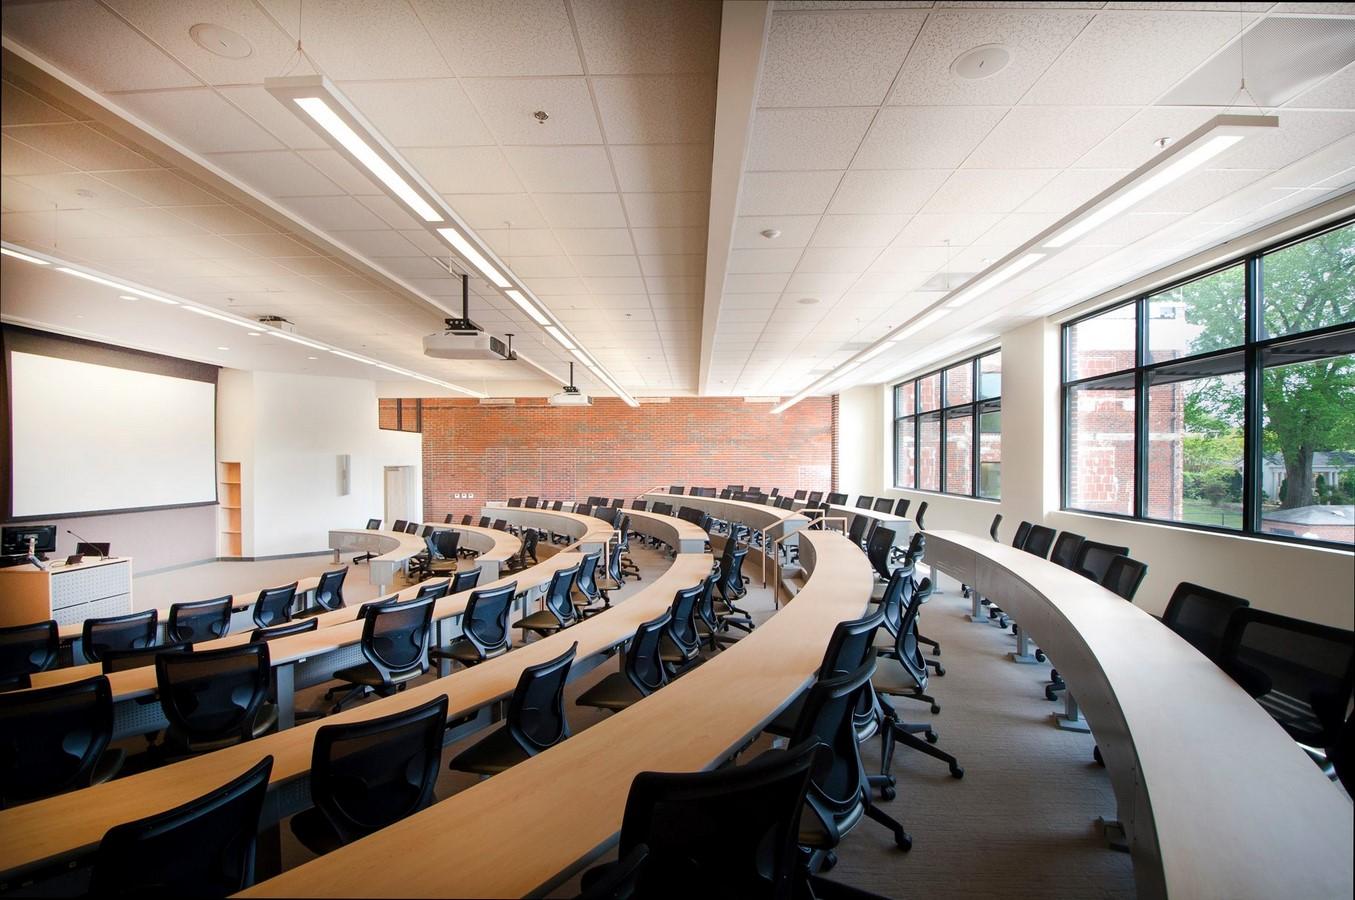 Newnan hospital renovation for the University of West Georgia - Sheet2